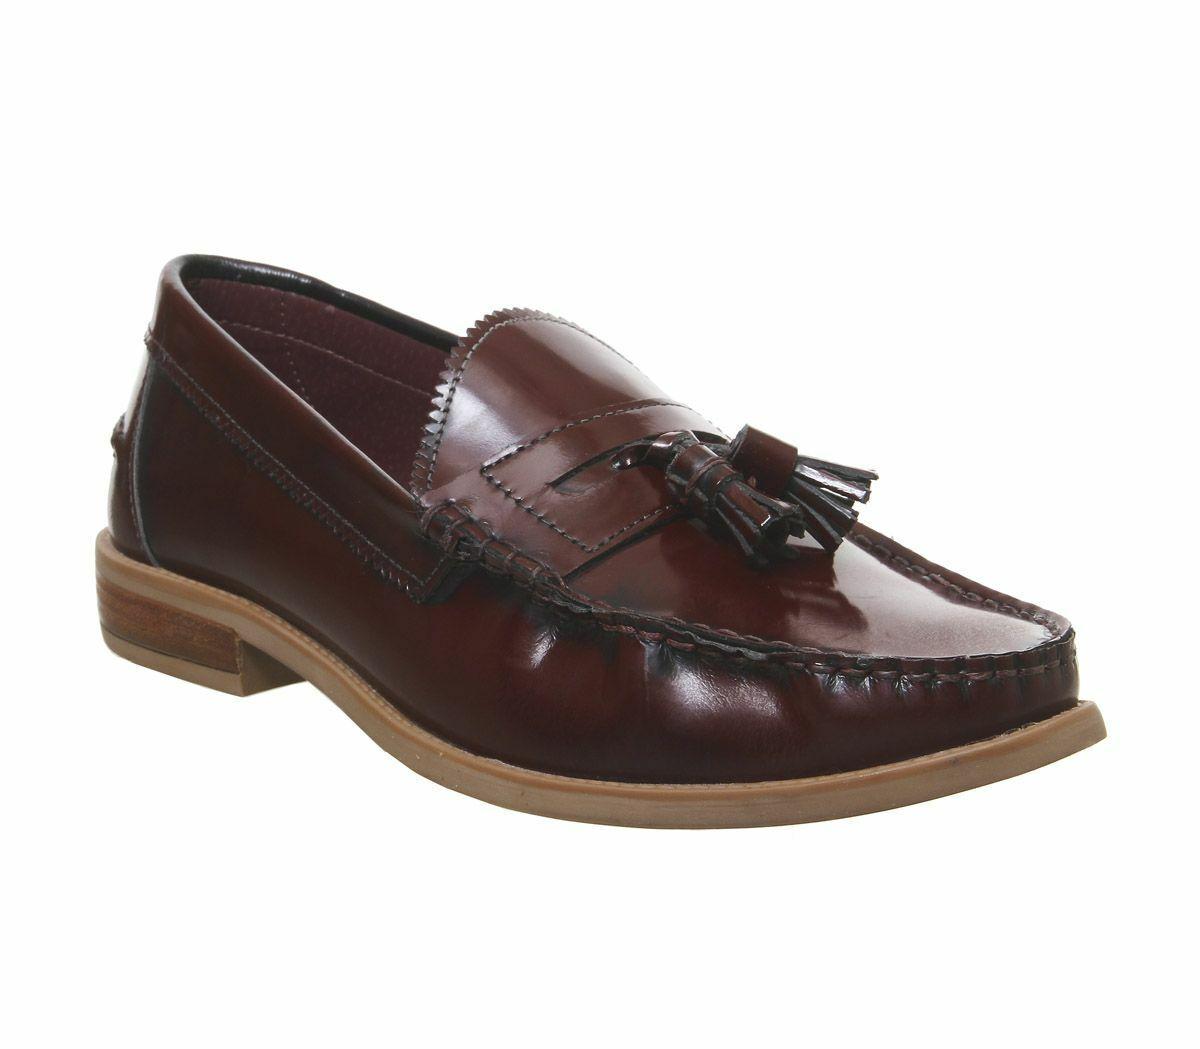 Mens Office Liho Tassel Loafers Bordo Hi Shine Leather Formal schuhe